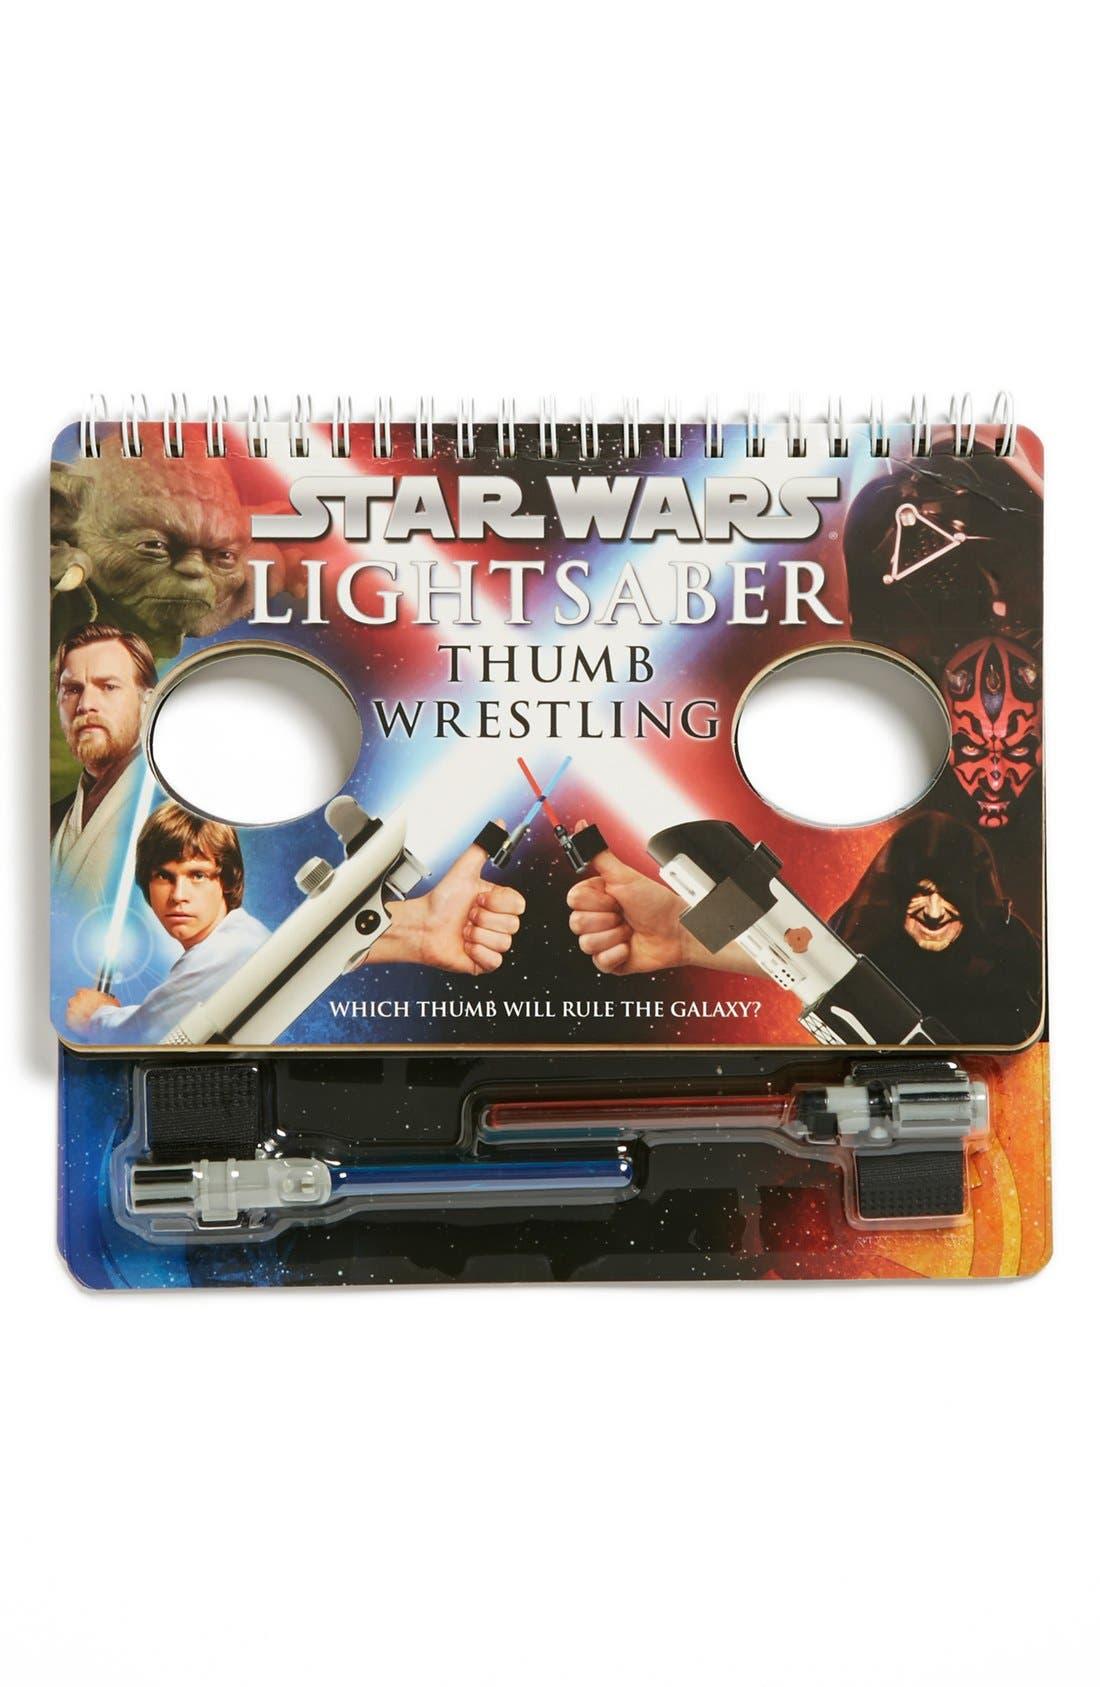 Alternate Image 1 Selected - 'Star Wars™ Lightsaber Thumb Wrestling' Book